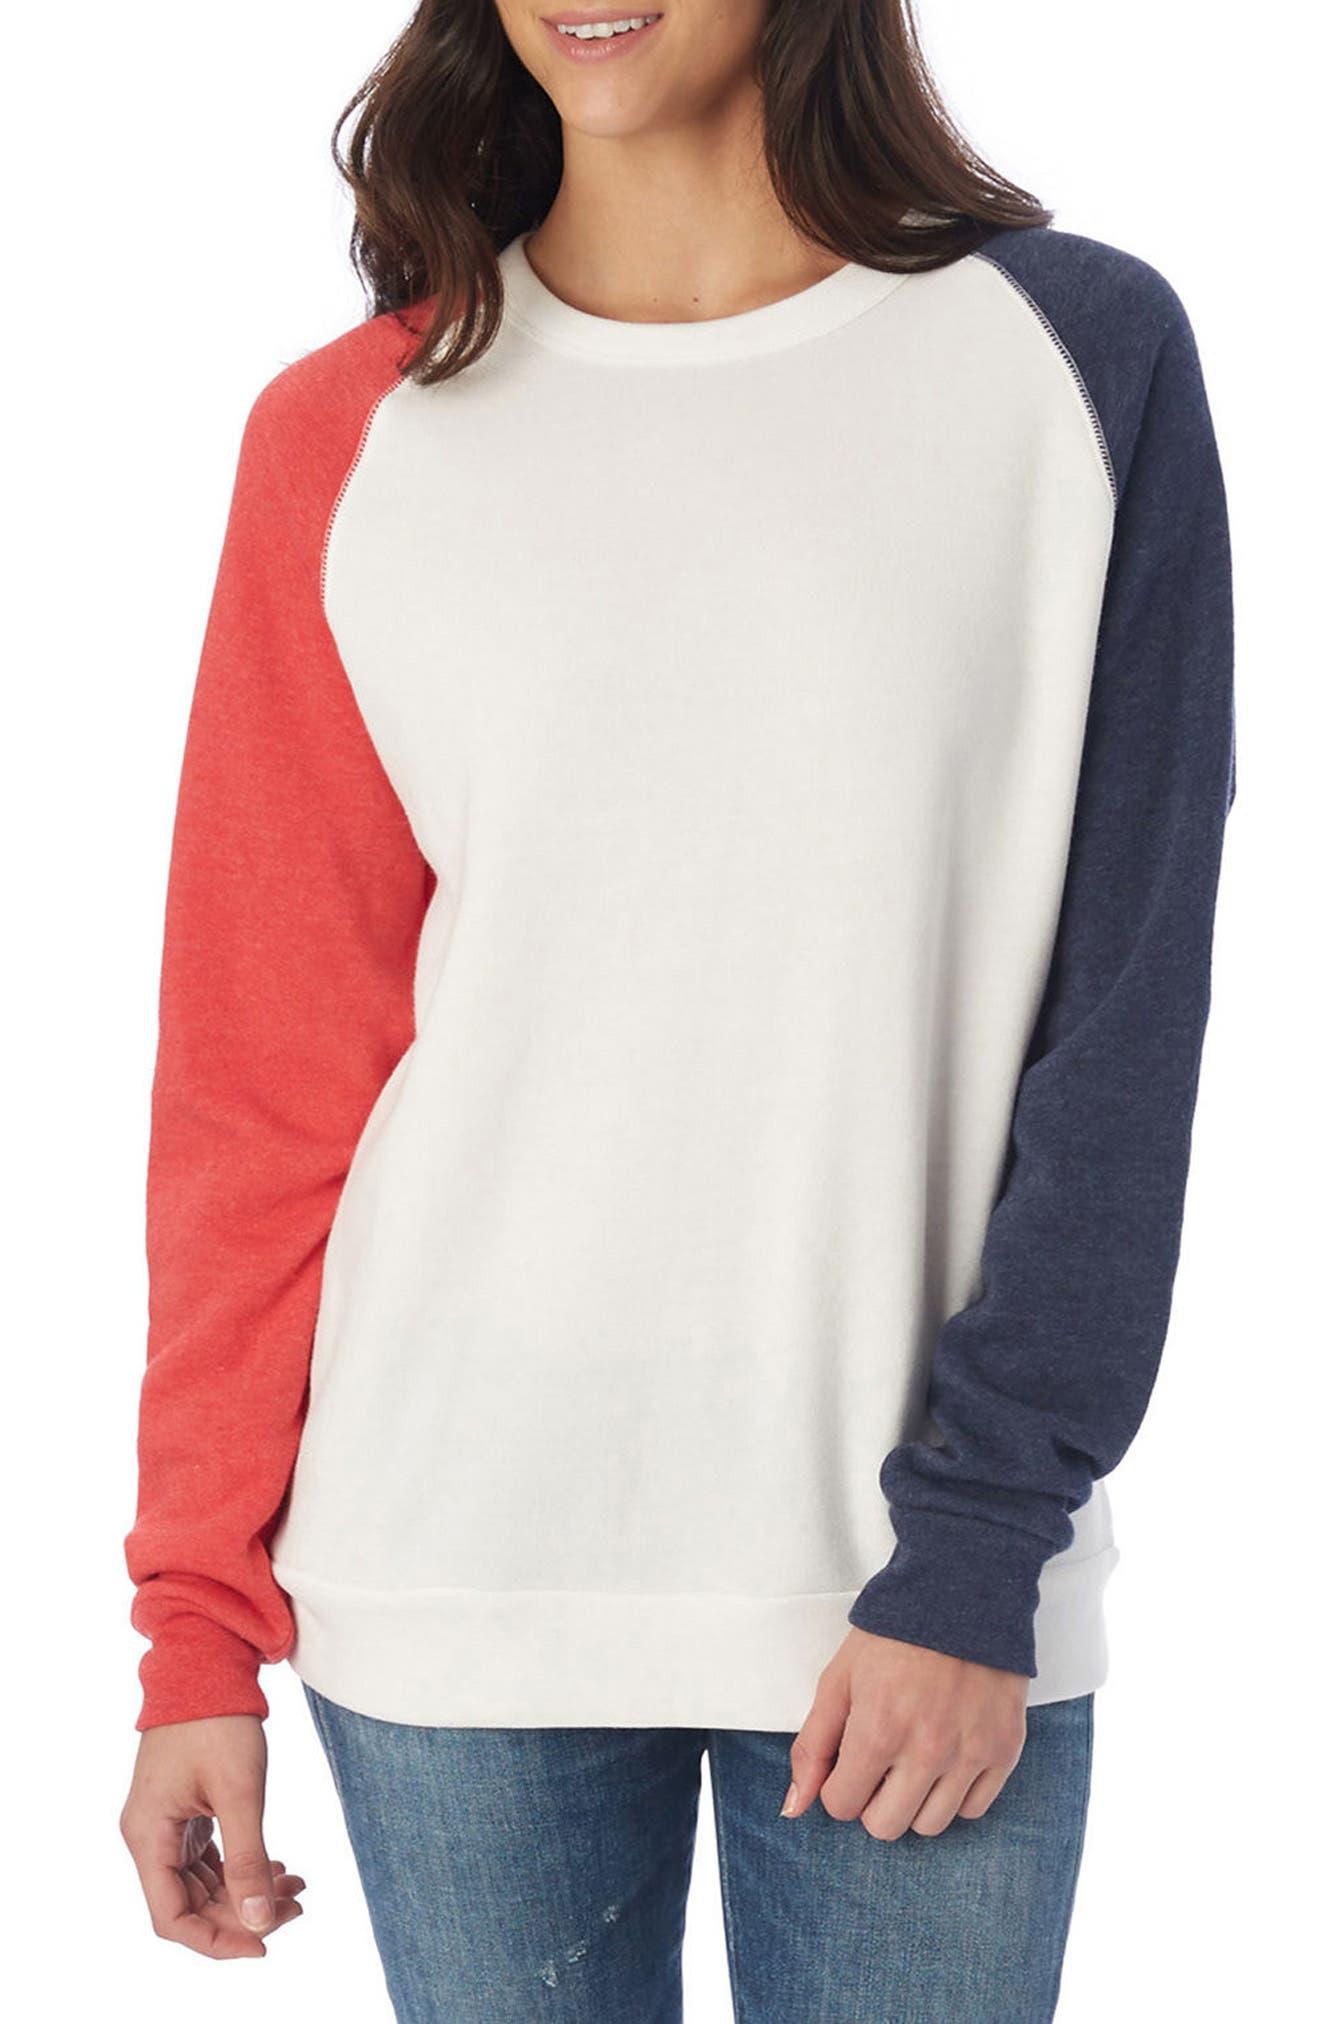 Alternative USA Champ Sweatshirt